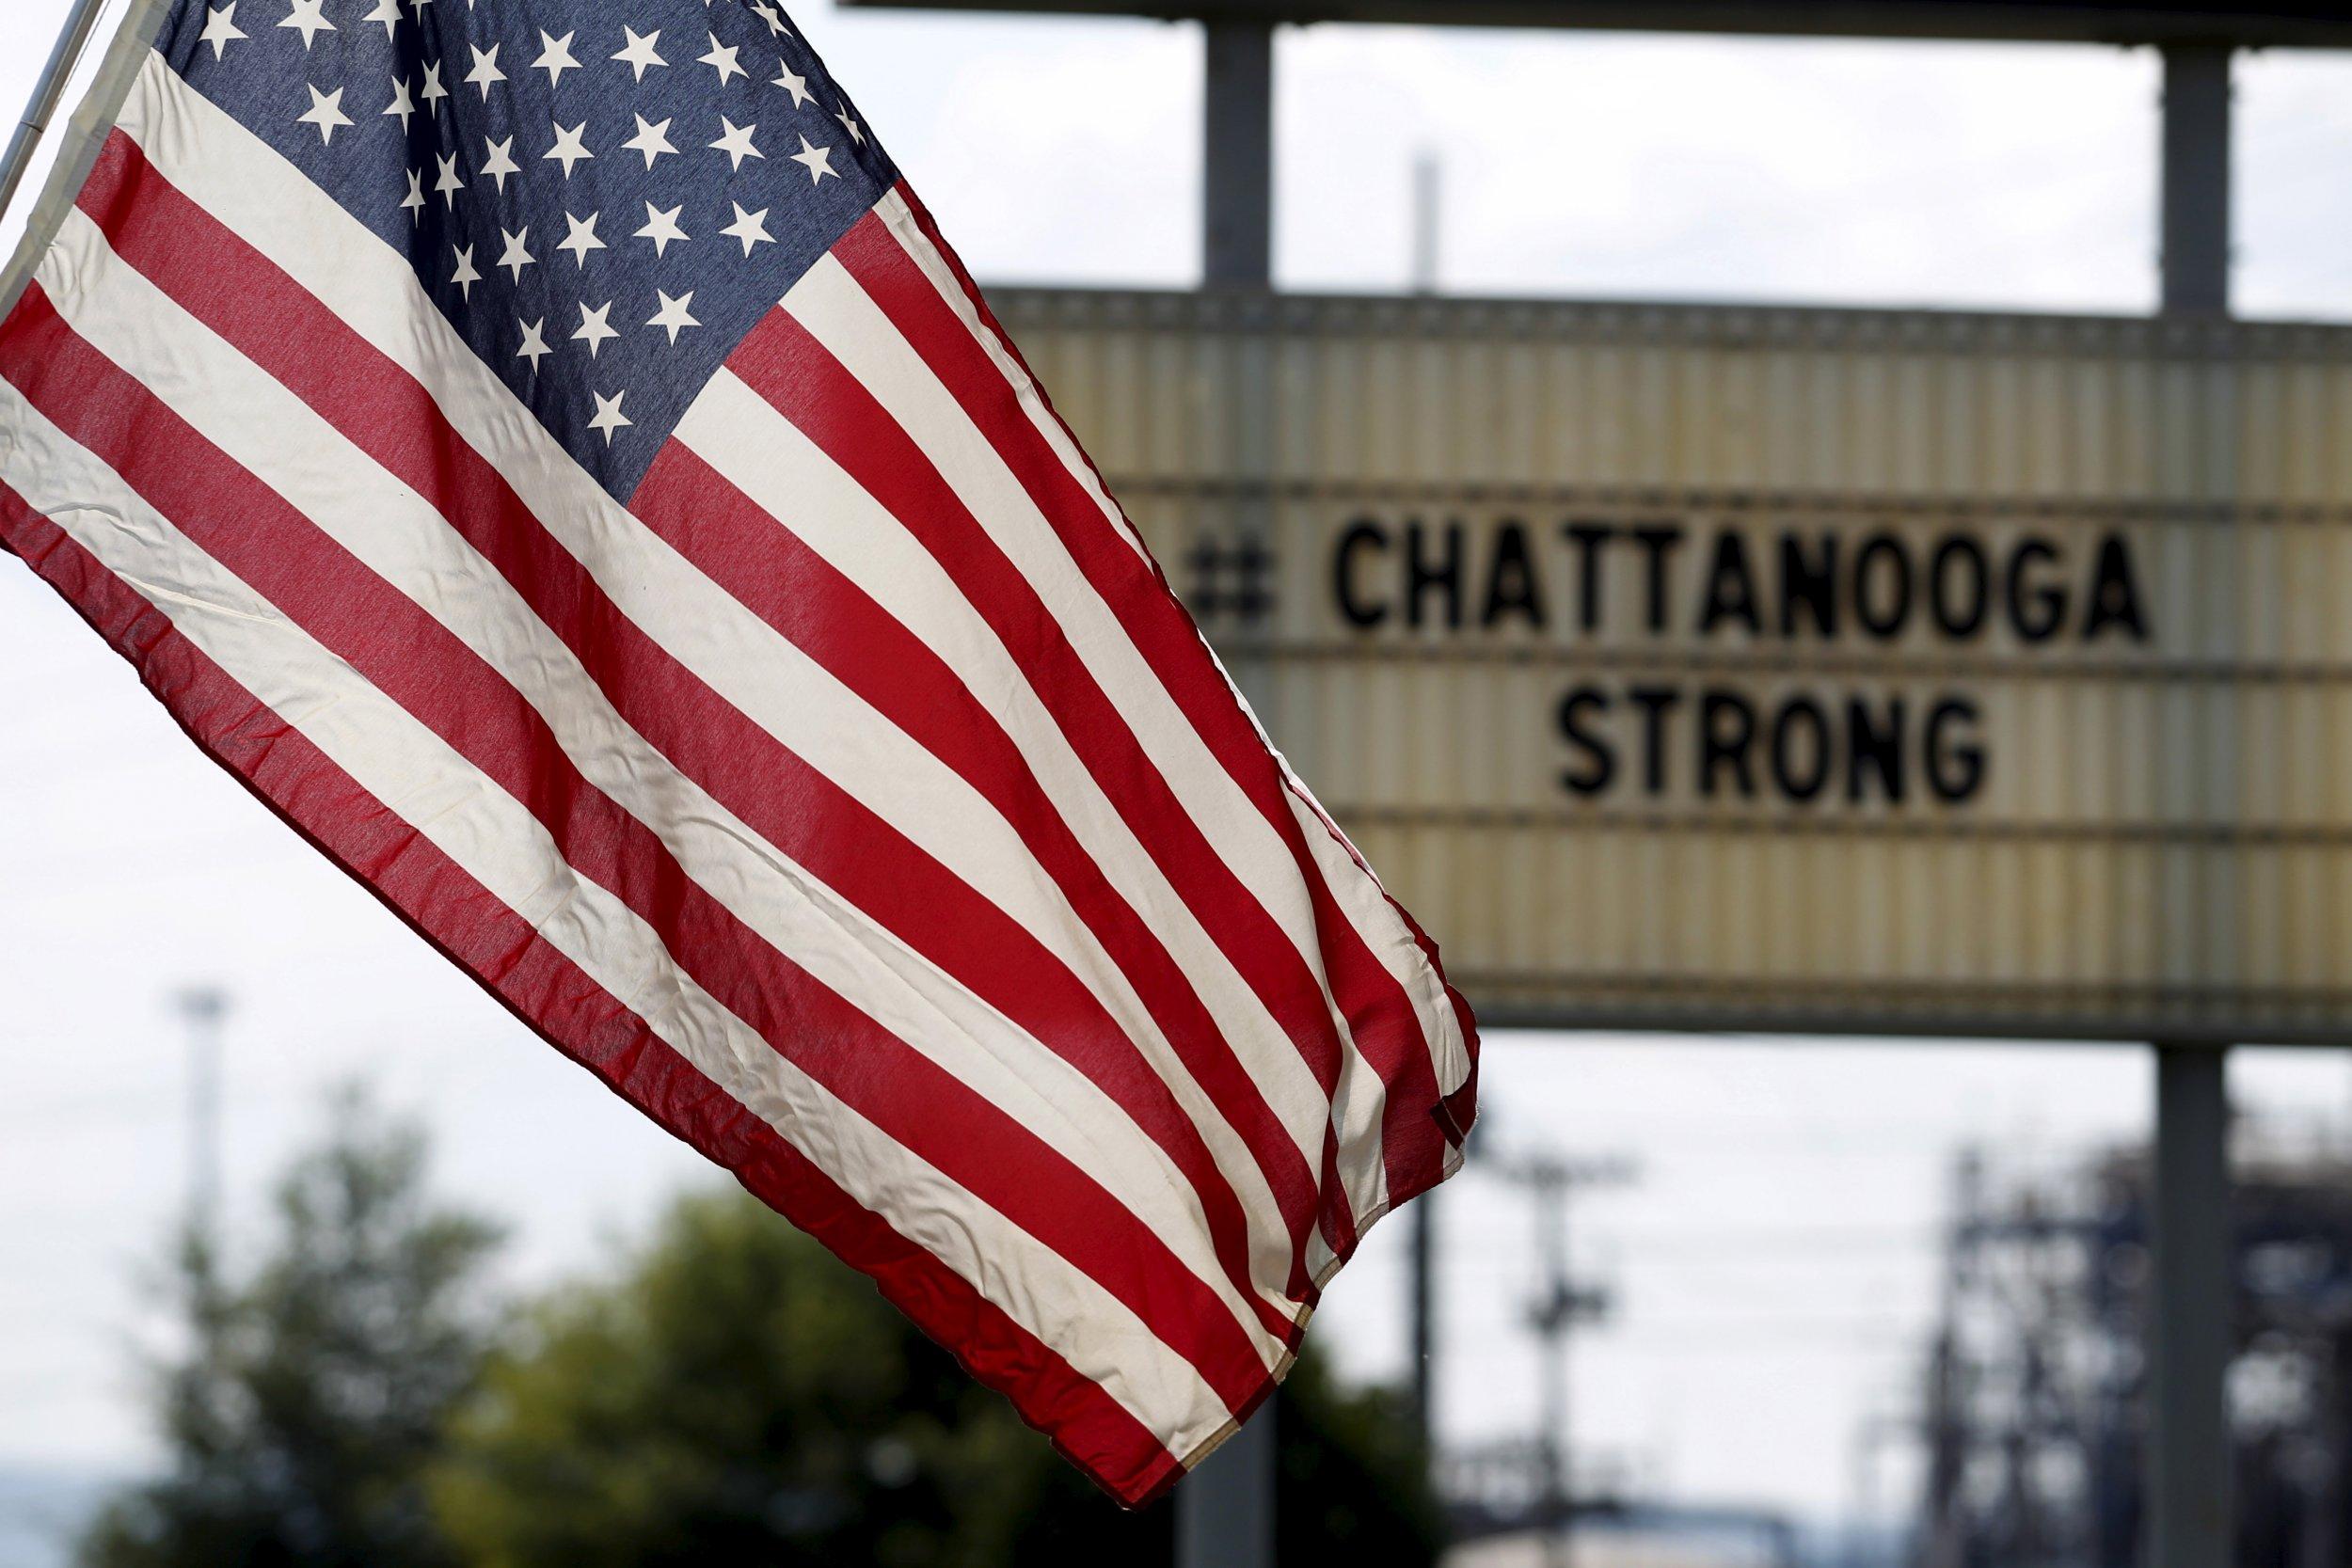 Chattanooga_0719